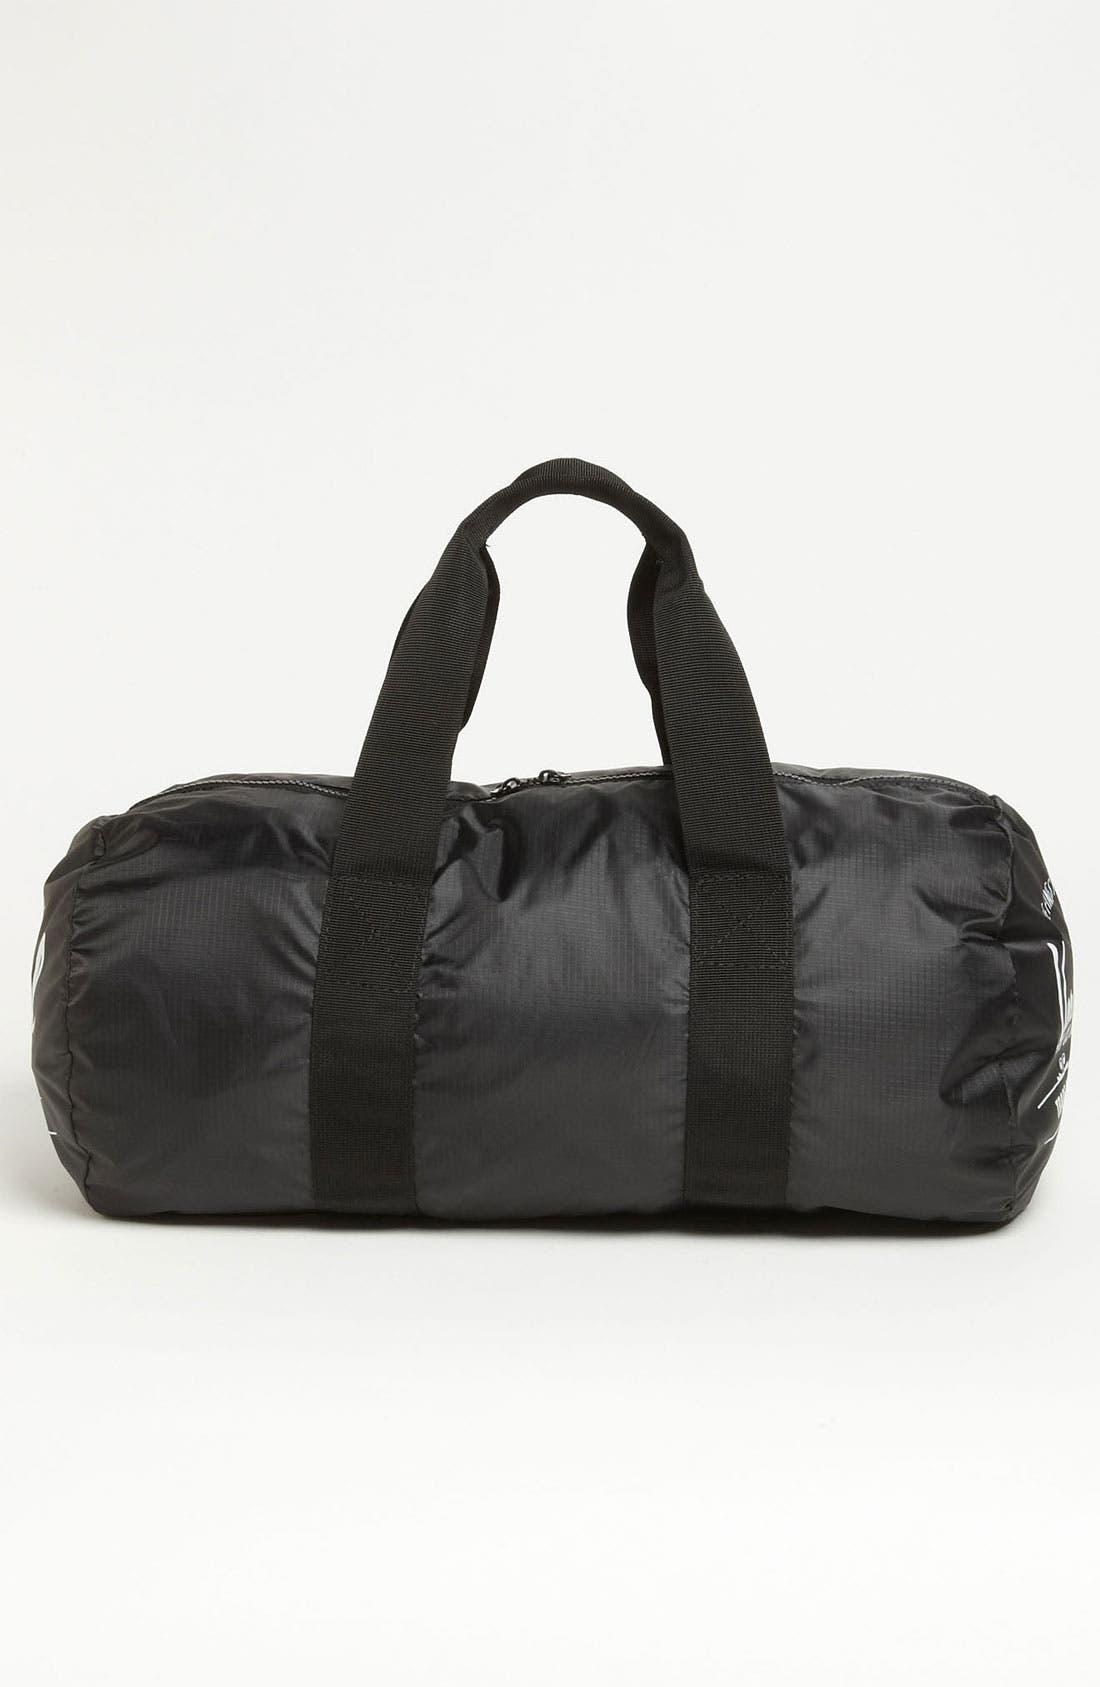 Alternate Image 2  - Herschel Supply Co. 'Packable Collection' Duffel Bag